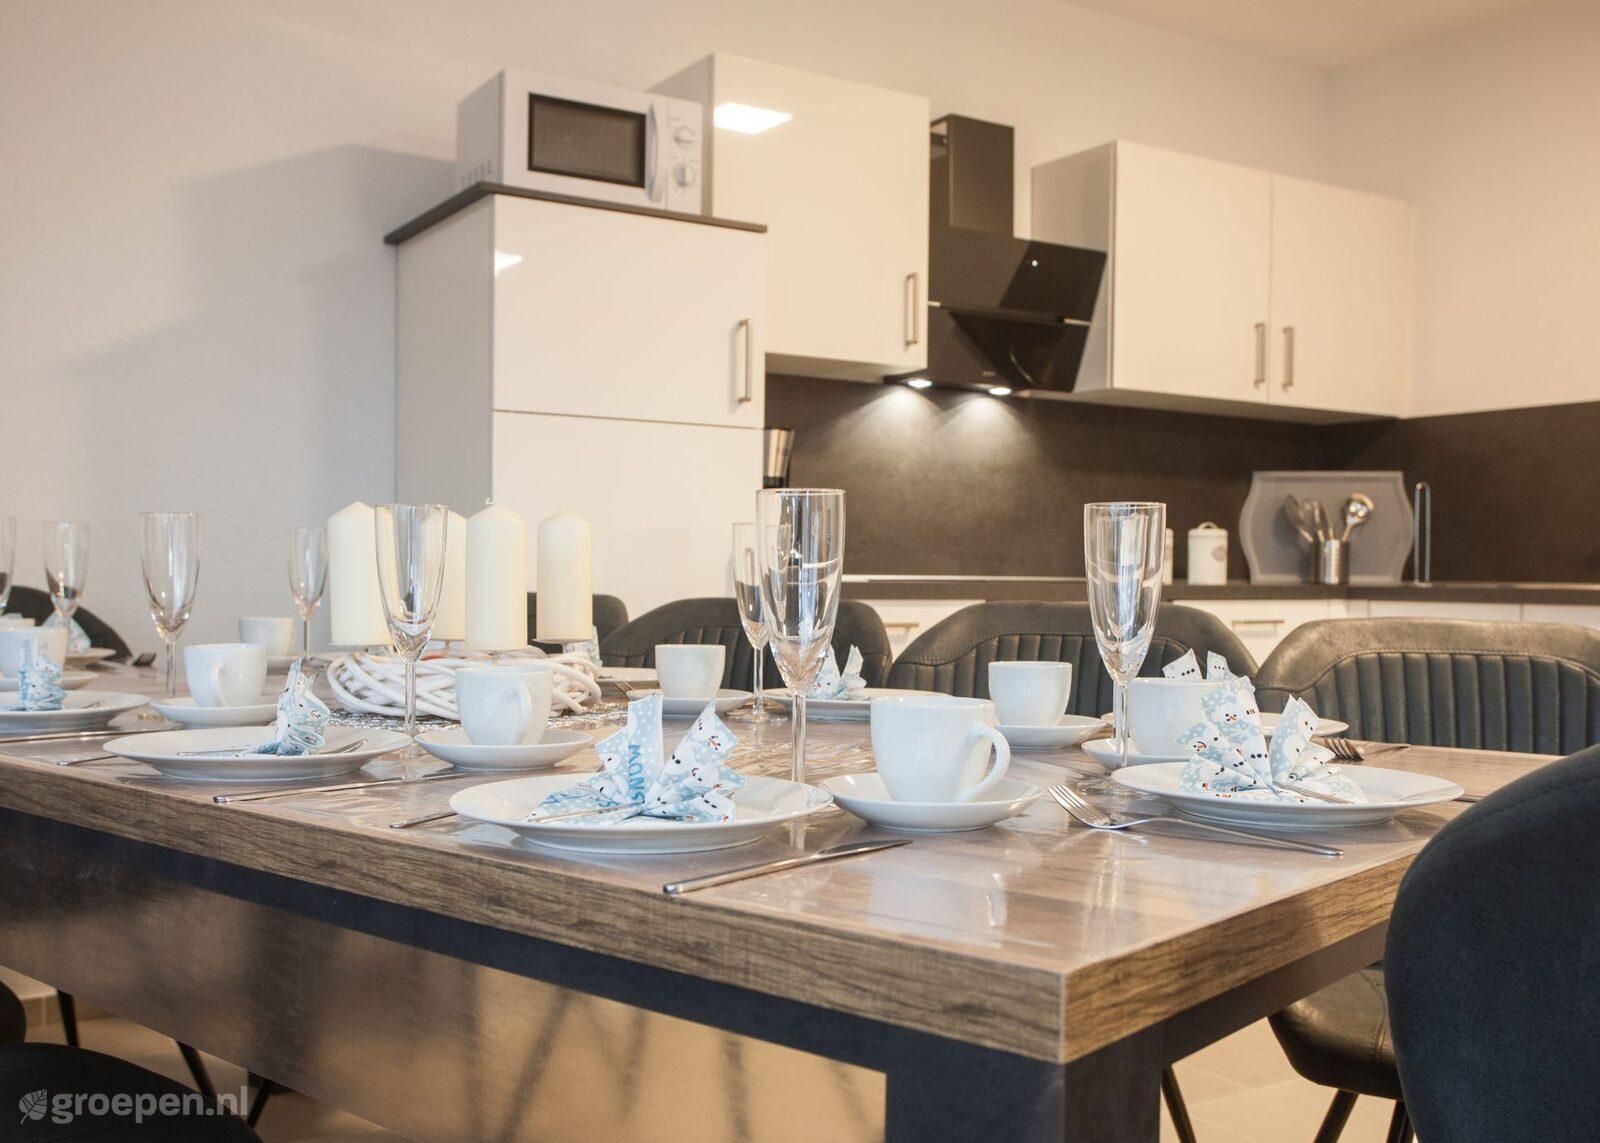 Group accommodation Altastenberg